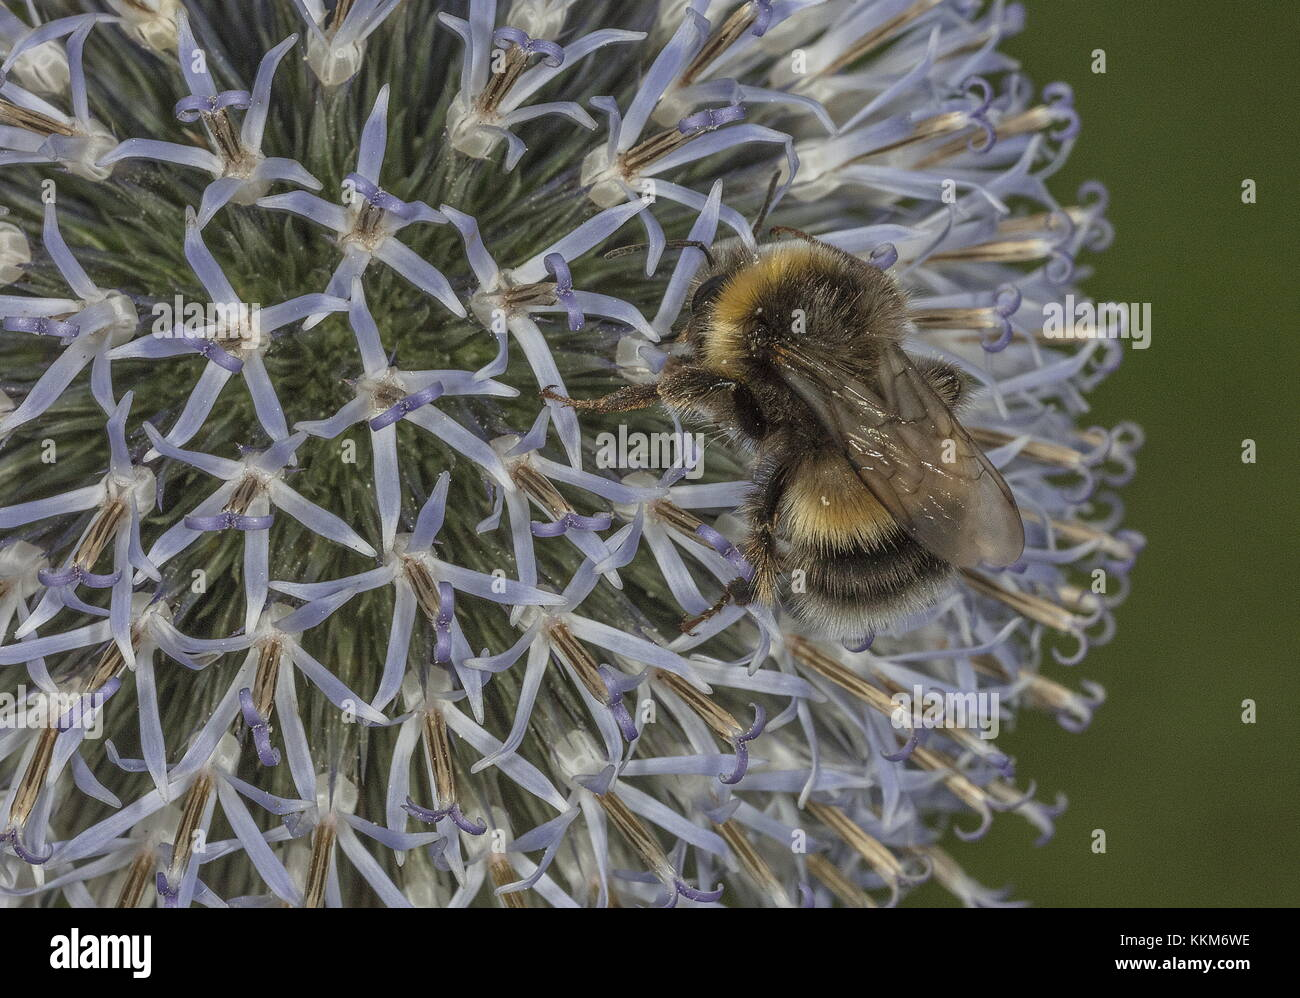 Worker buff-tailed bumblebee, Bombus terrestris, feeding on Globe thistle in garden. - Stock Image